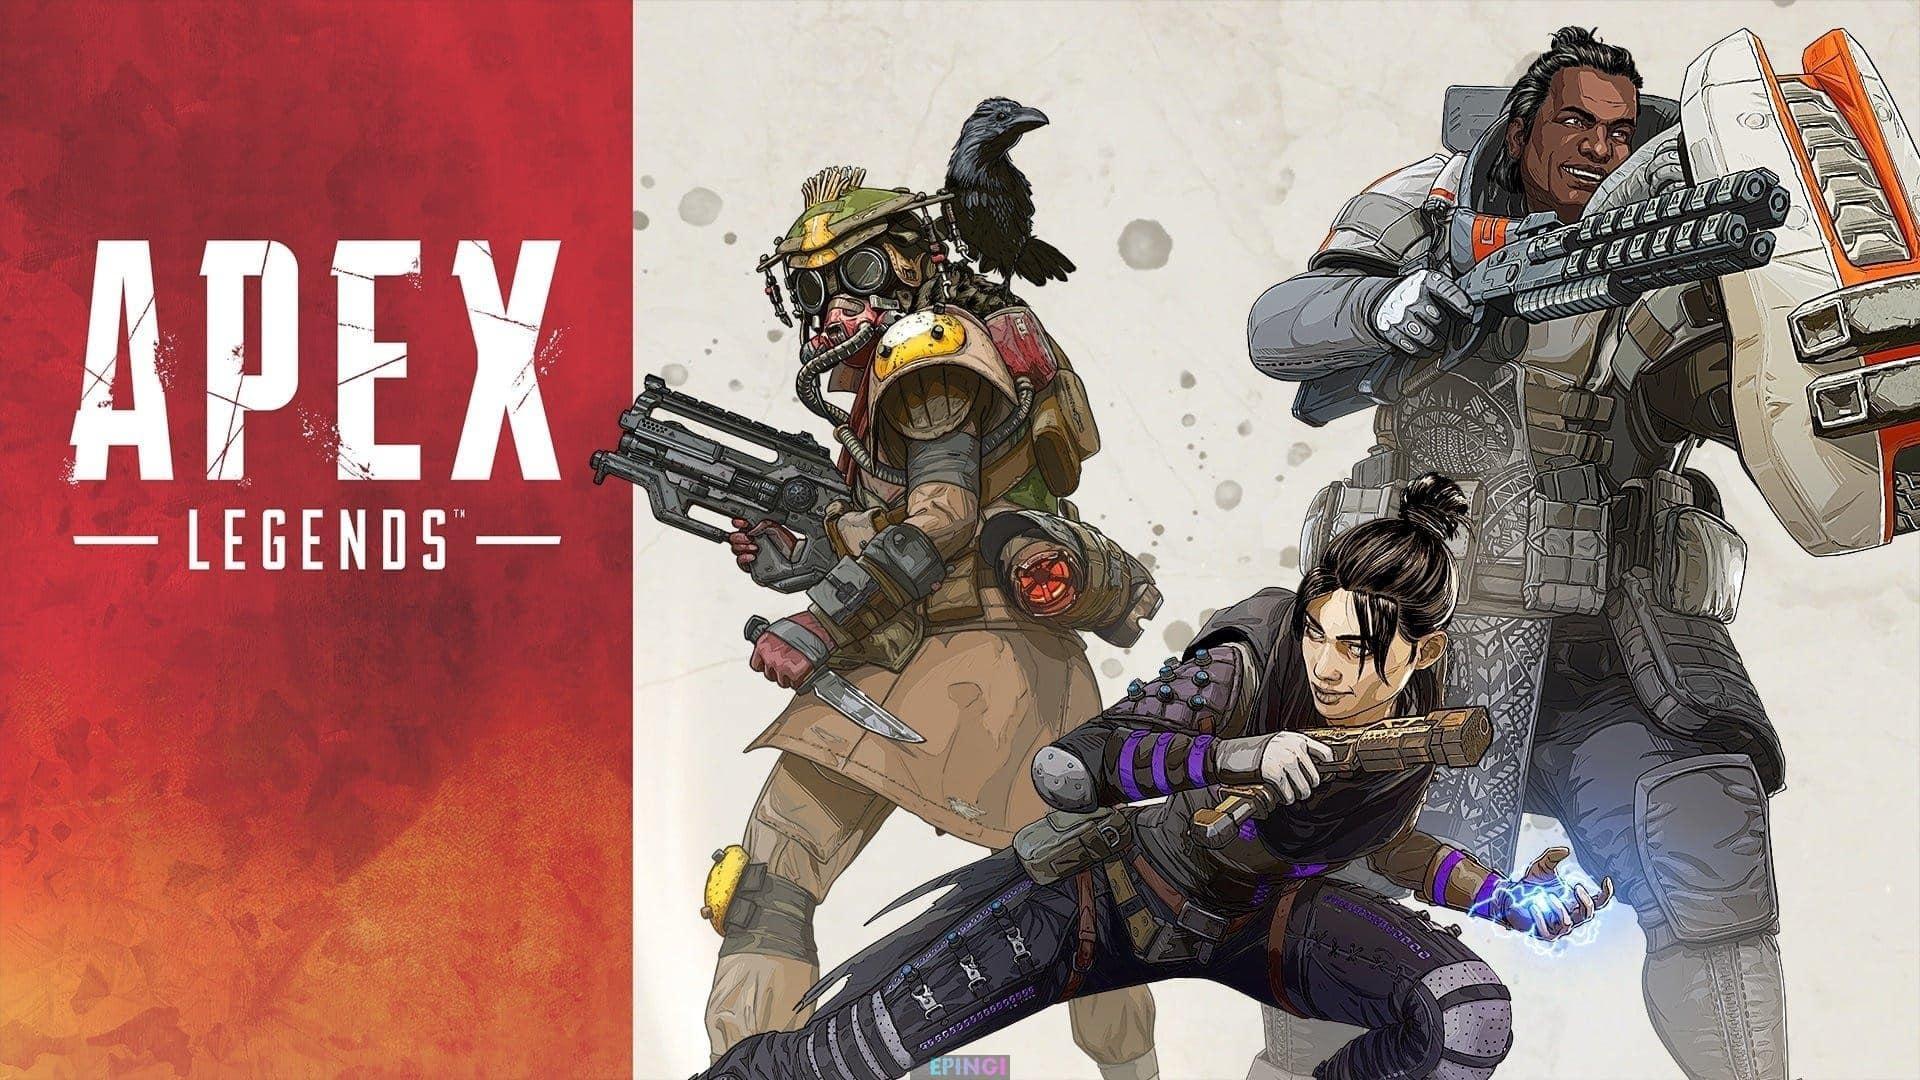 Apex Legends: confira a análise completa desse game!